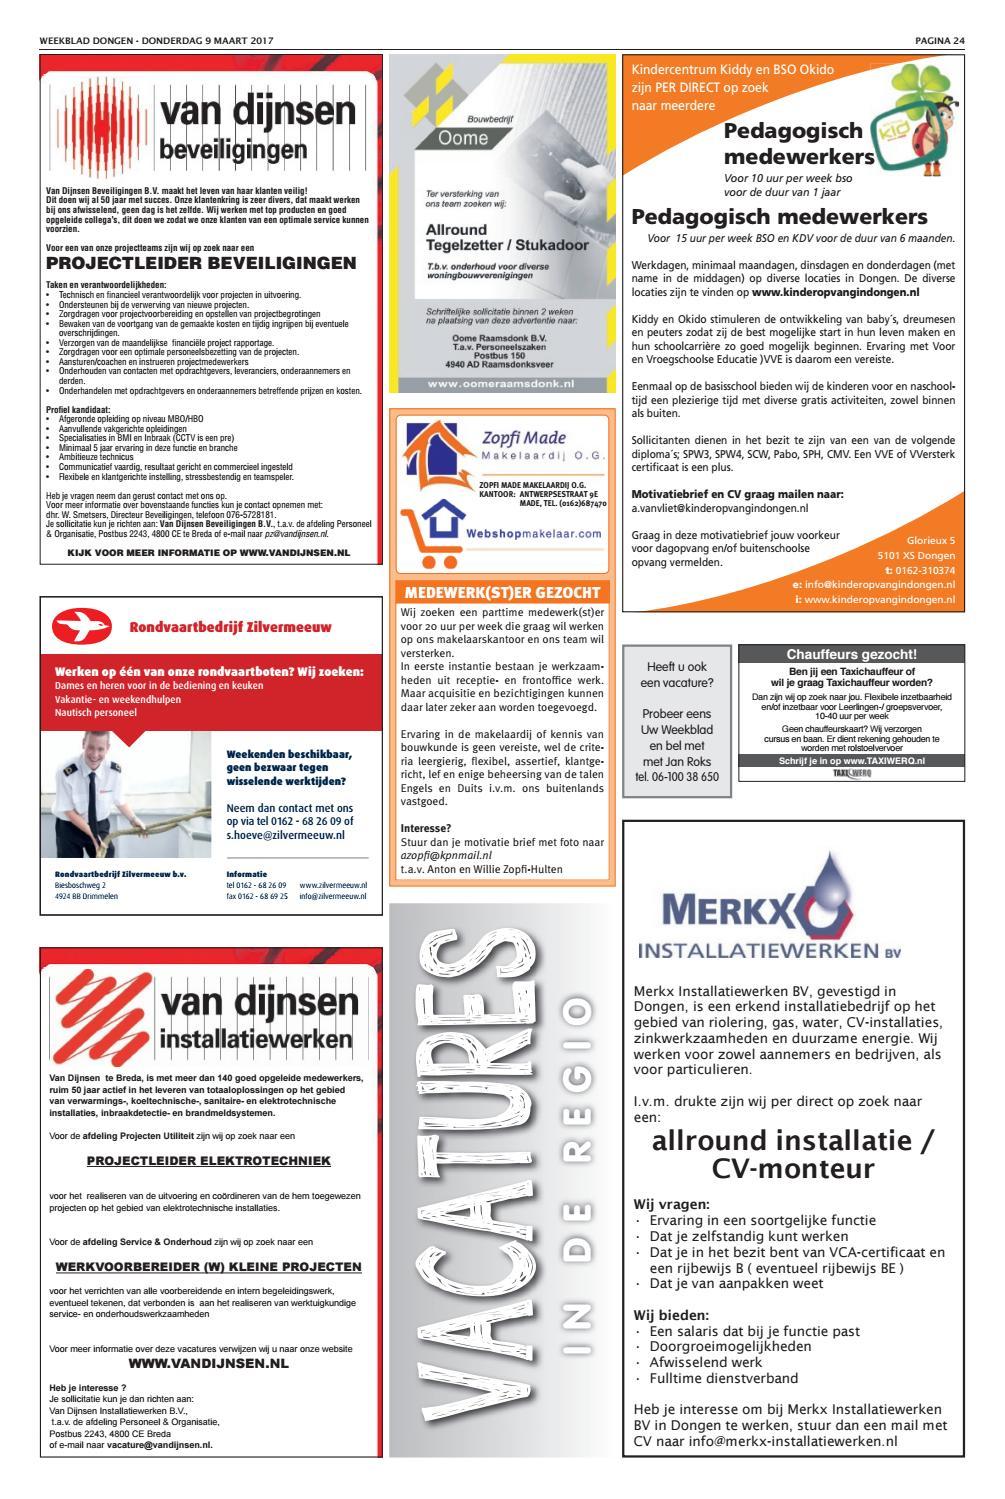 motivatiebrief taxichauffeur Weekblad Dongen 09 03 2017 by Uitgeverij Em de Jong   issuu motivatiebrief taxichauffeur